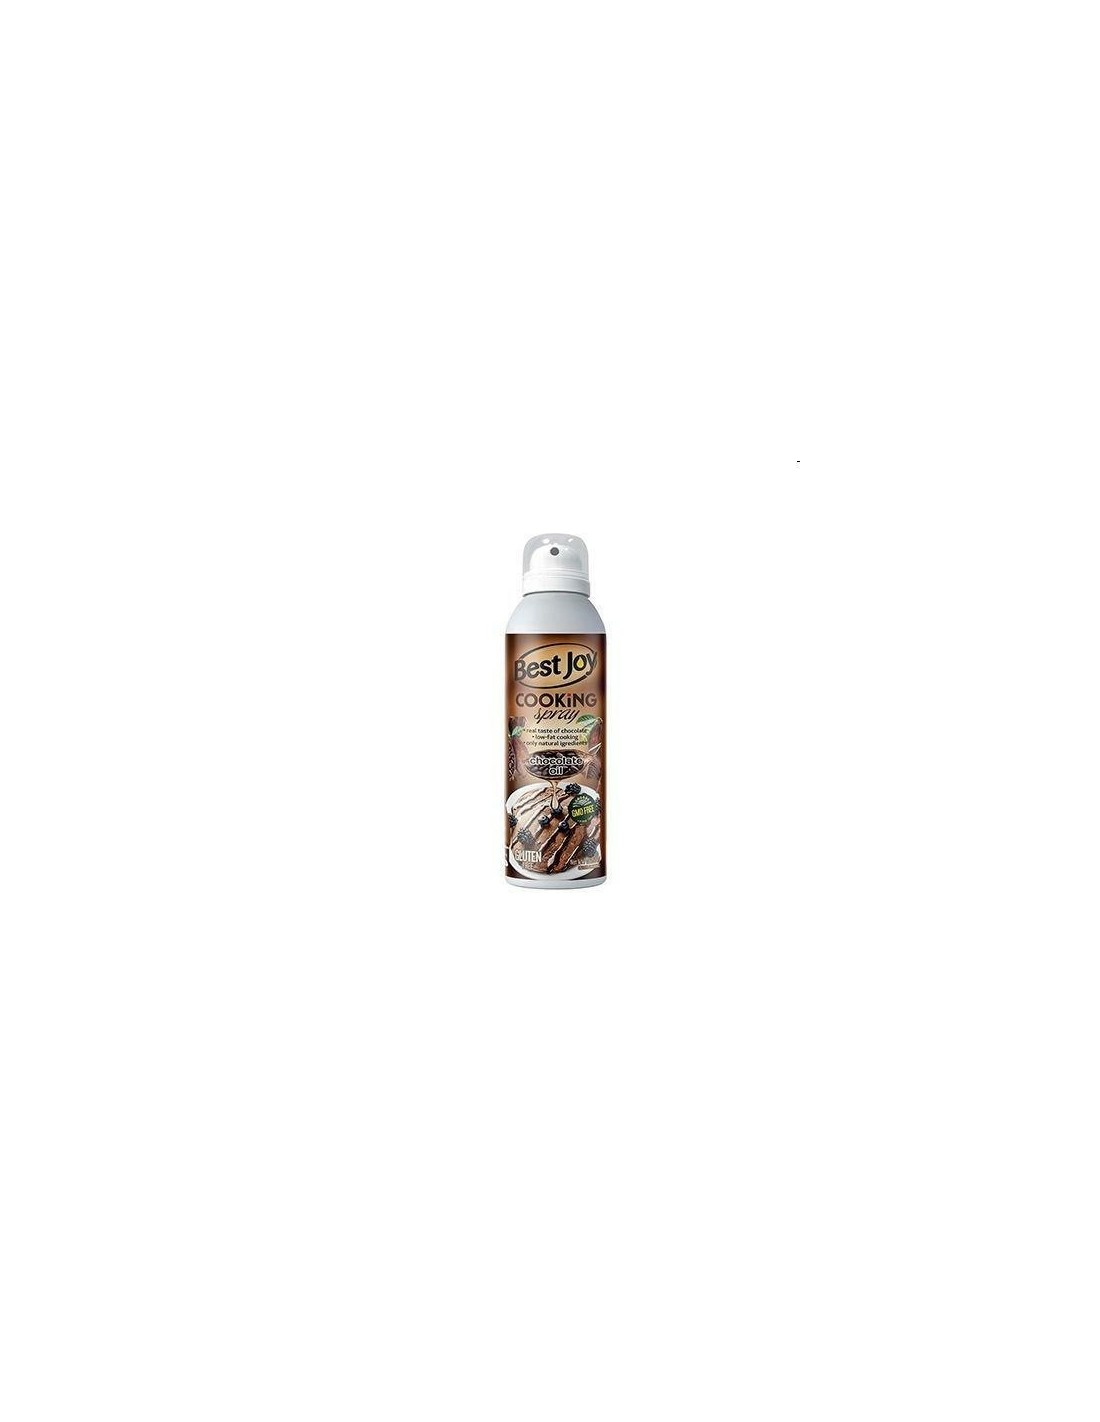 Cooking Spray Olio al Cioccolato 250 ml